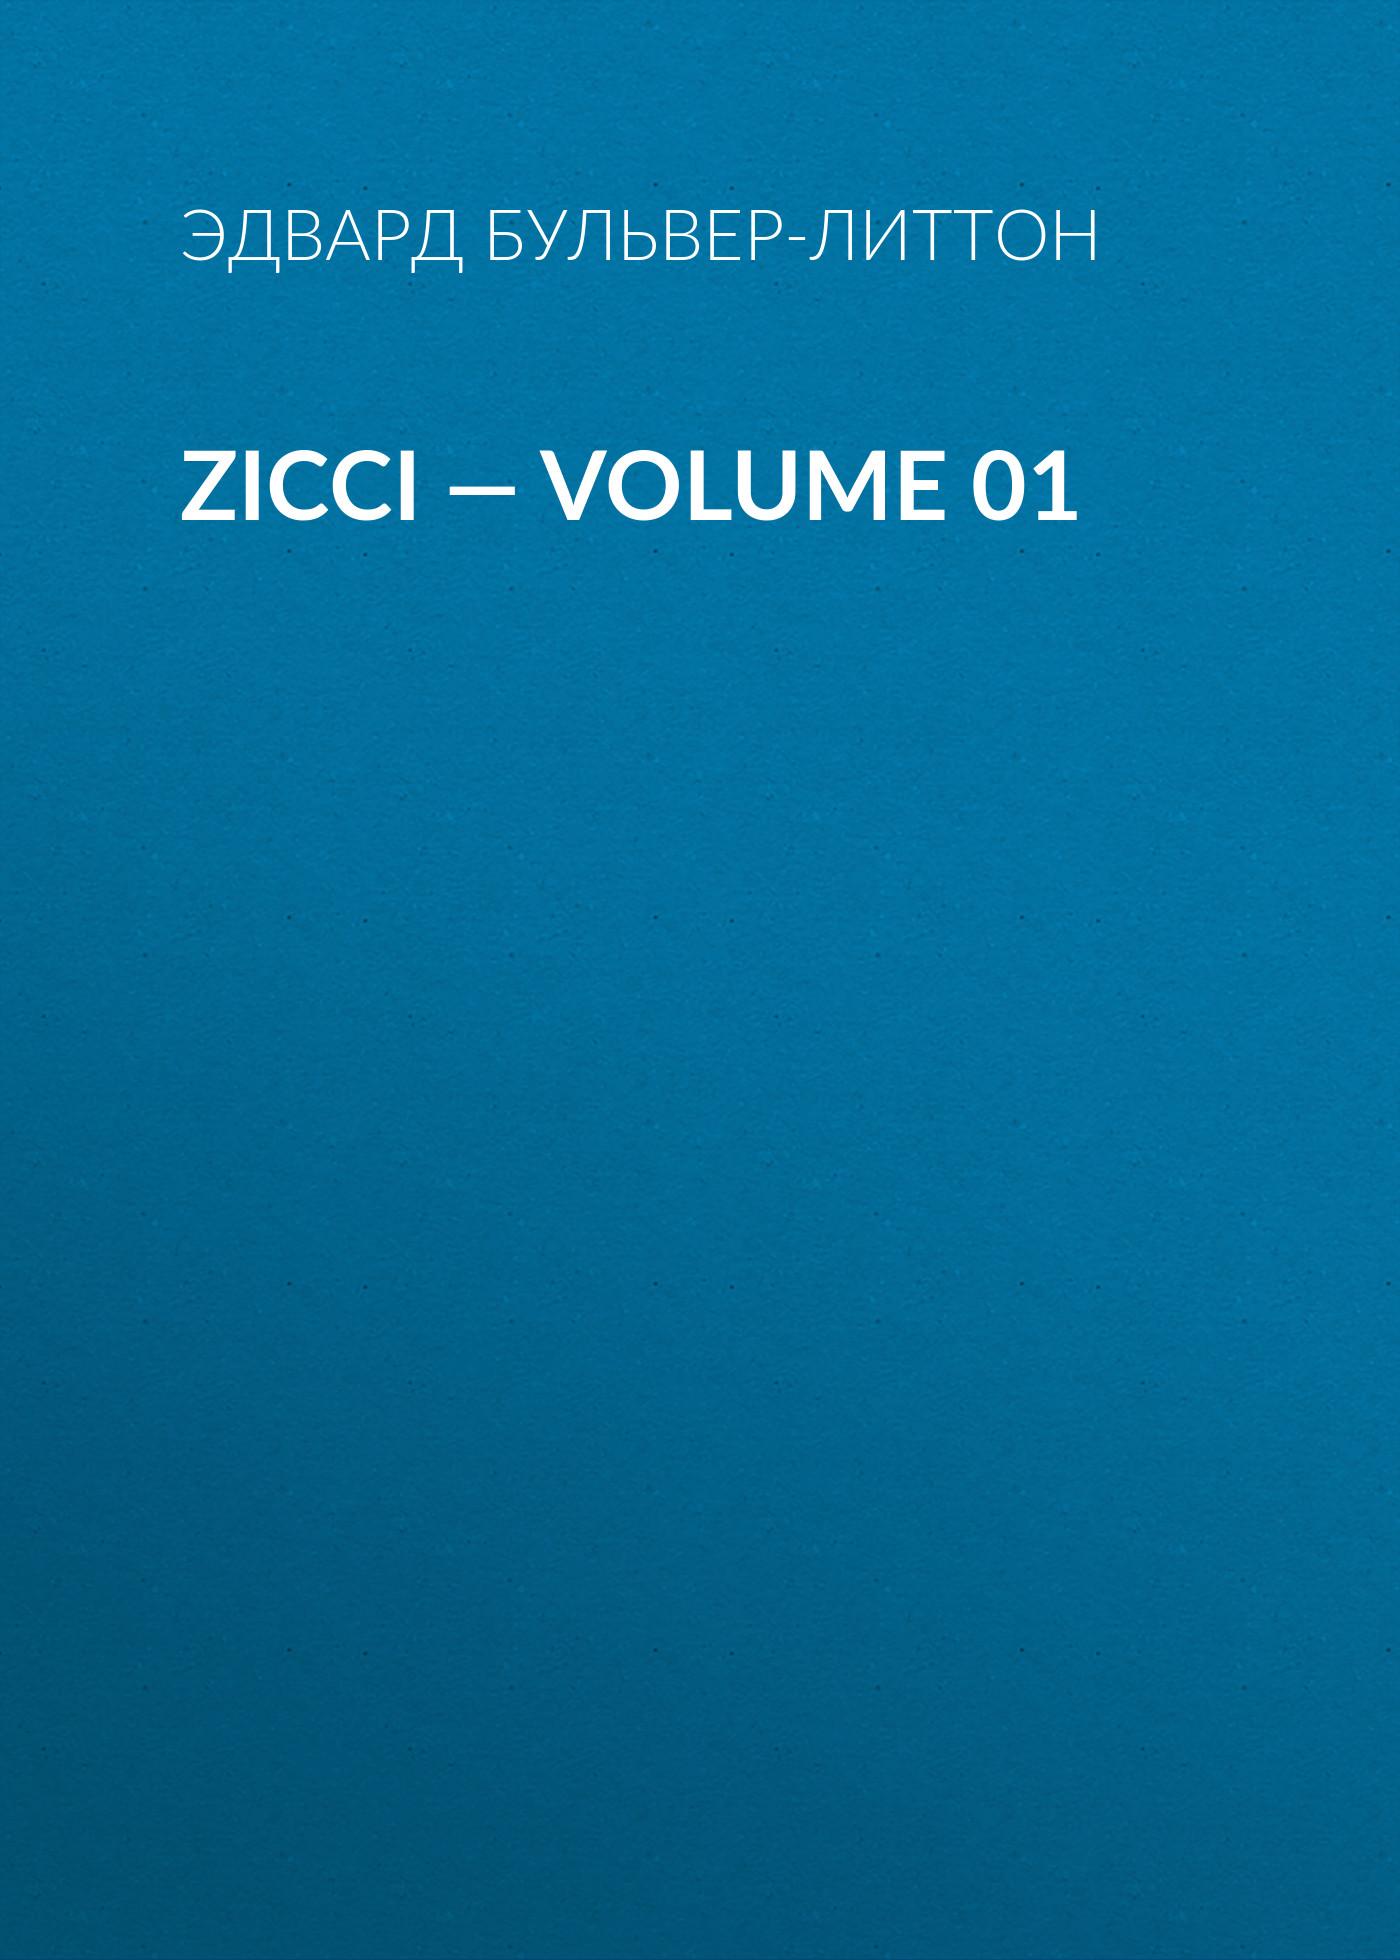 Эдвард Бульвер-Литтон Zicci — Volume 01 эдвард бульвер литтон devereux volume 01